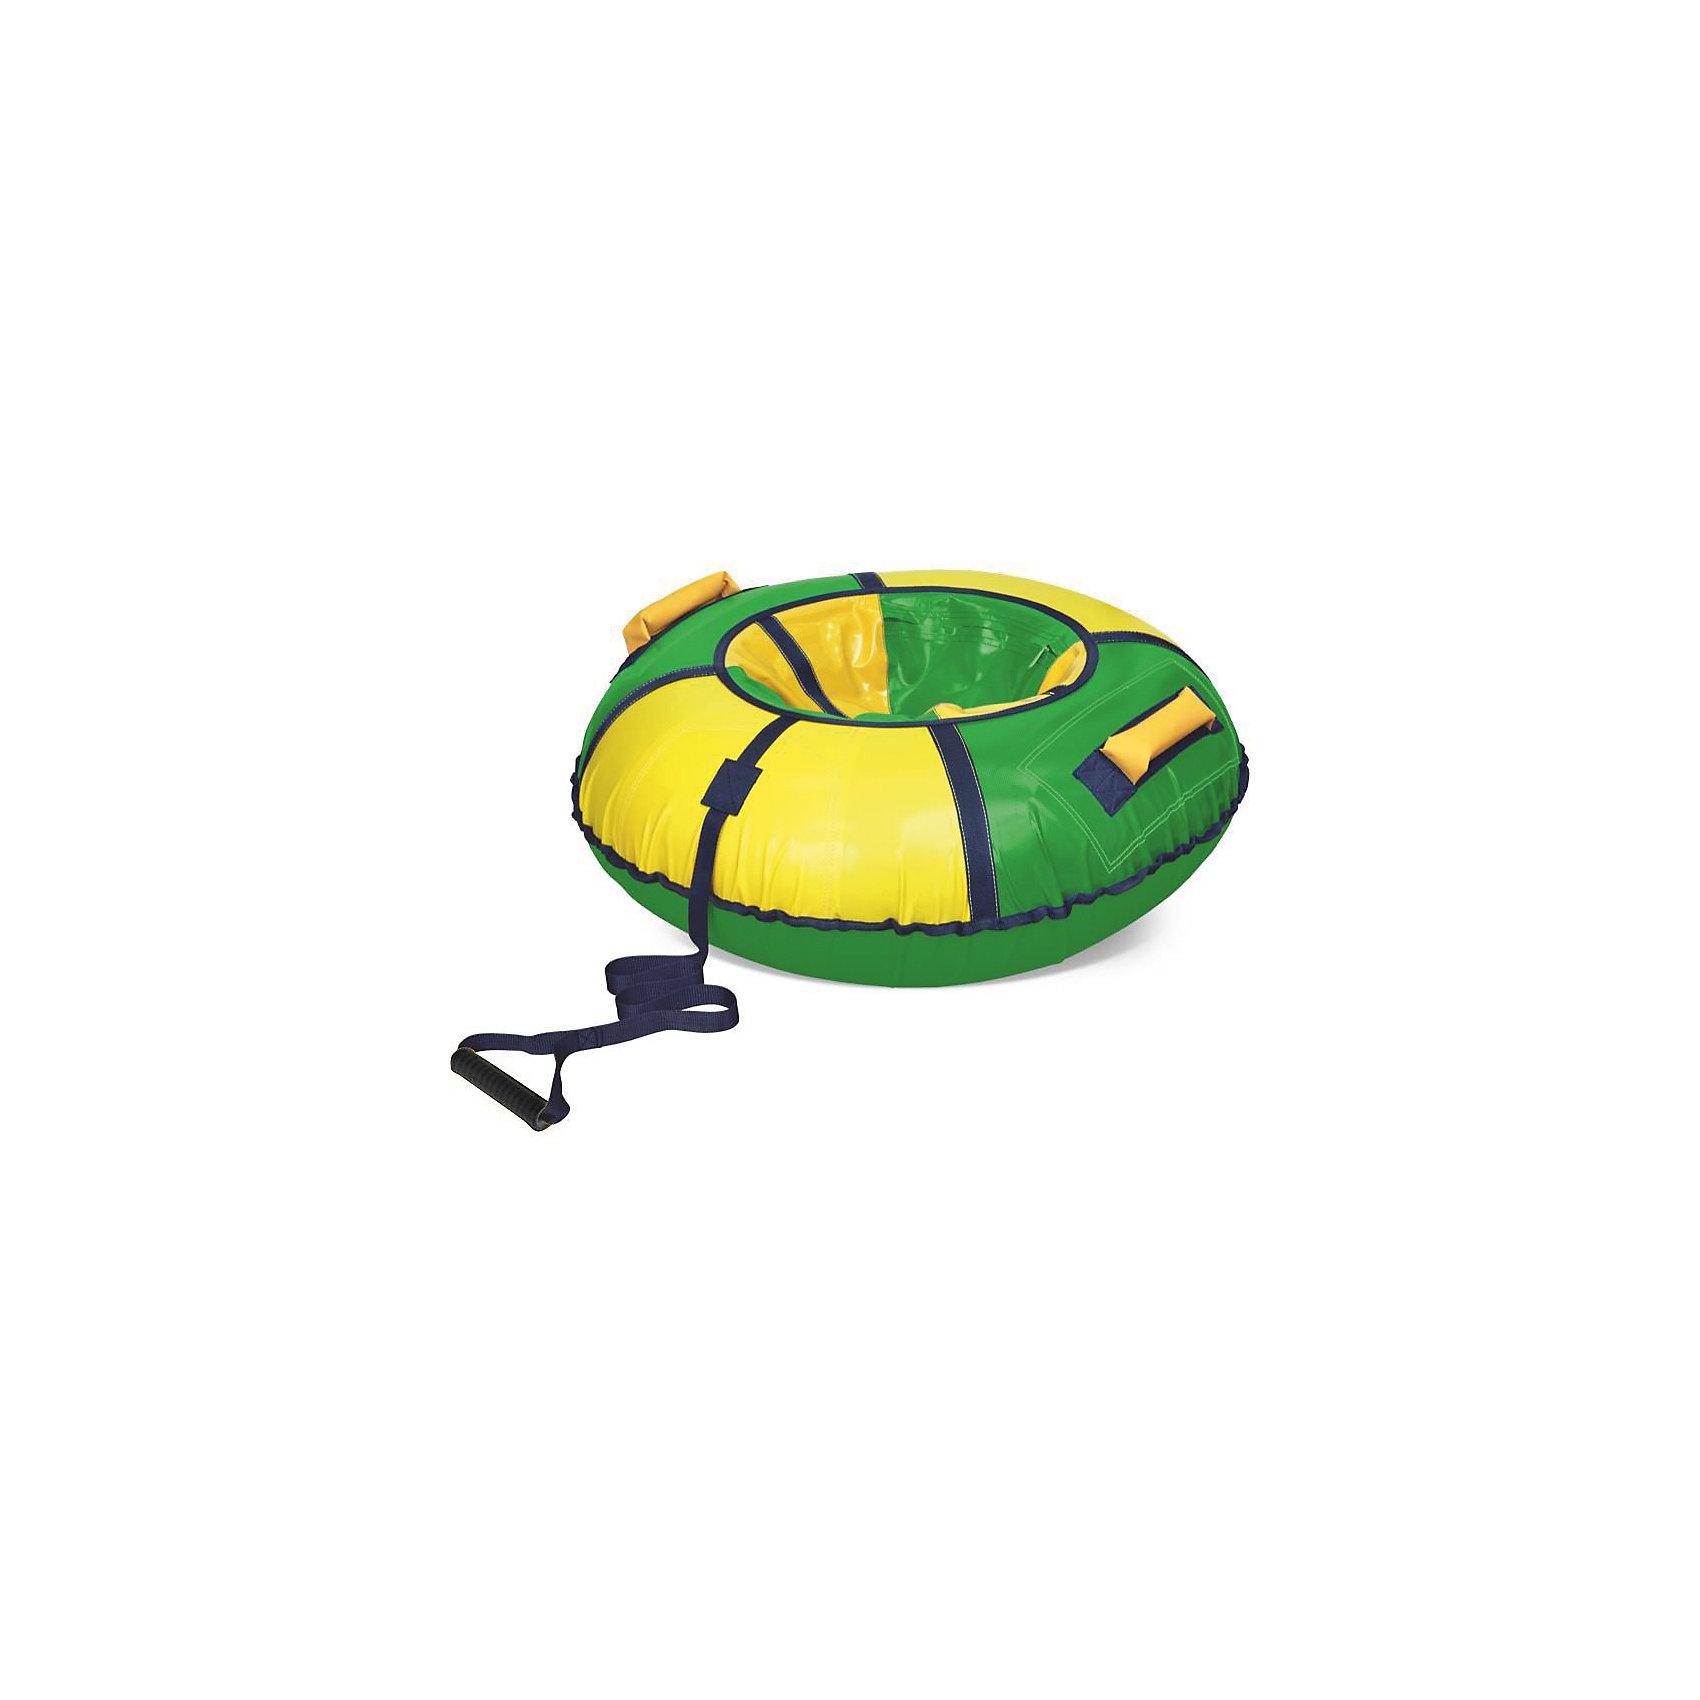 Тюбинг, жёлто-зеленый от myToys